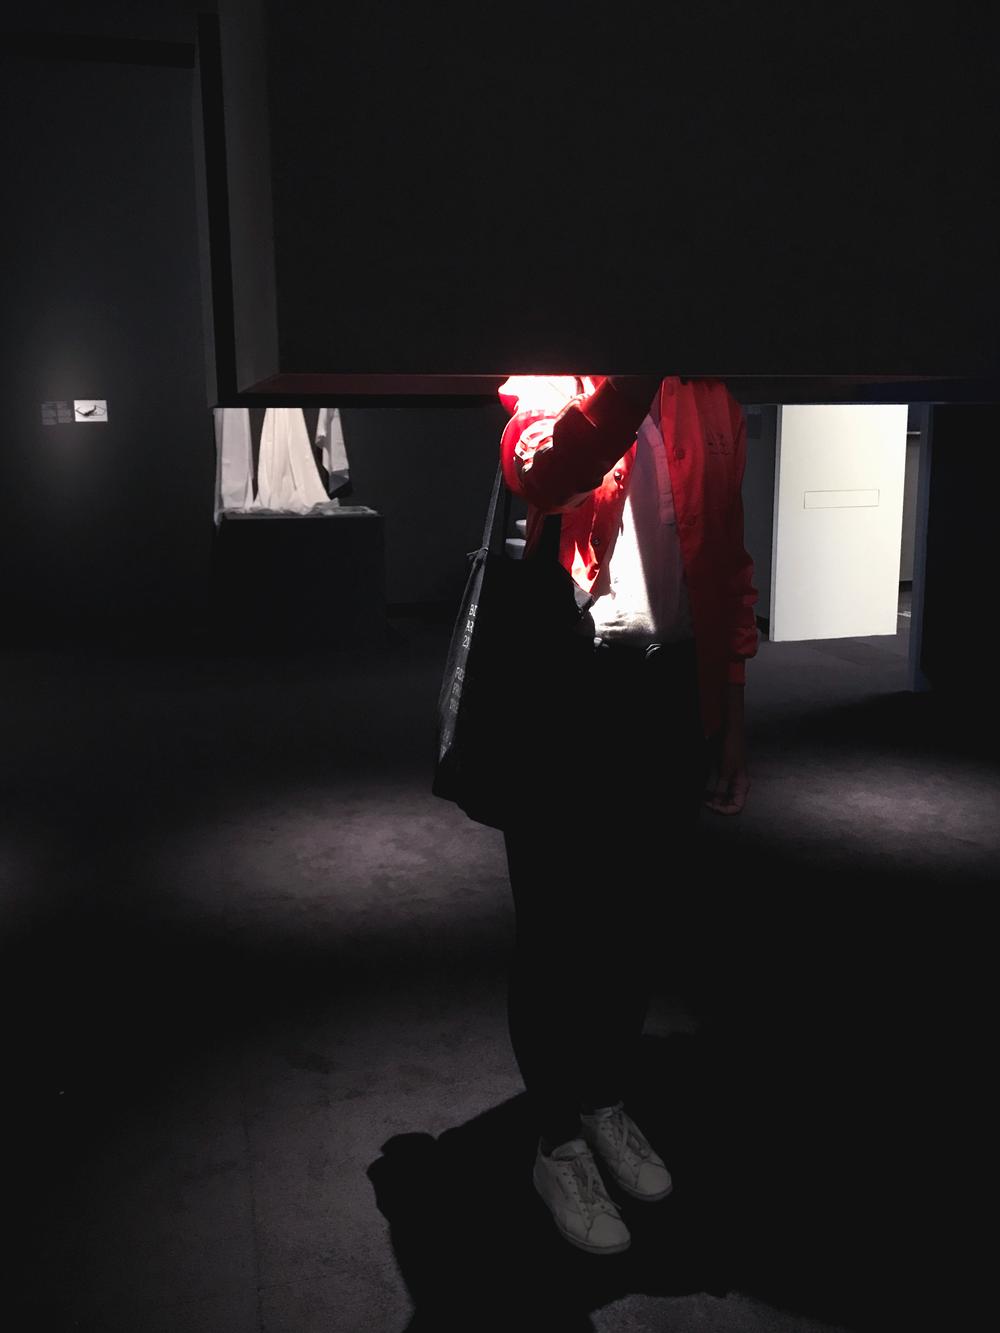 TWC-StedelijkMuseumVisit-2.png